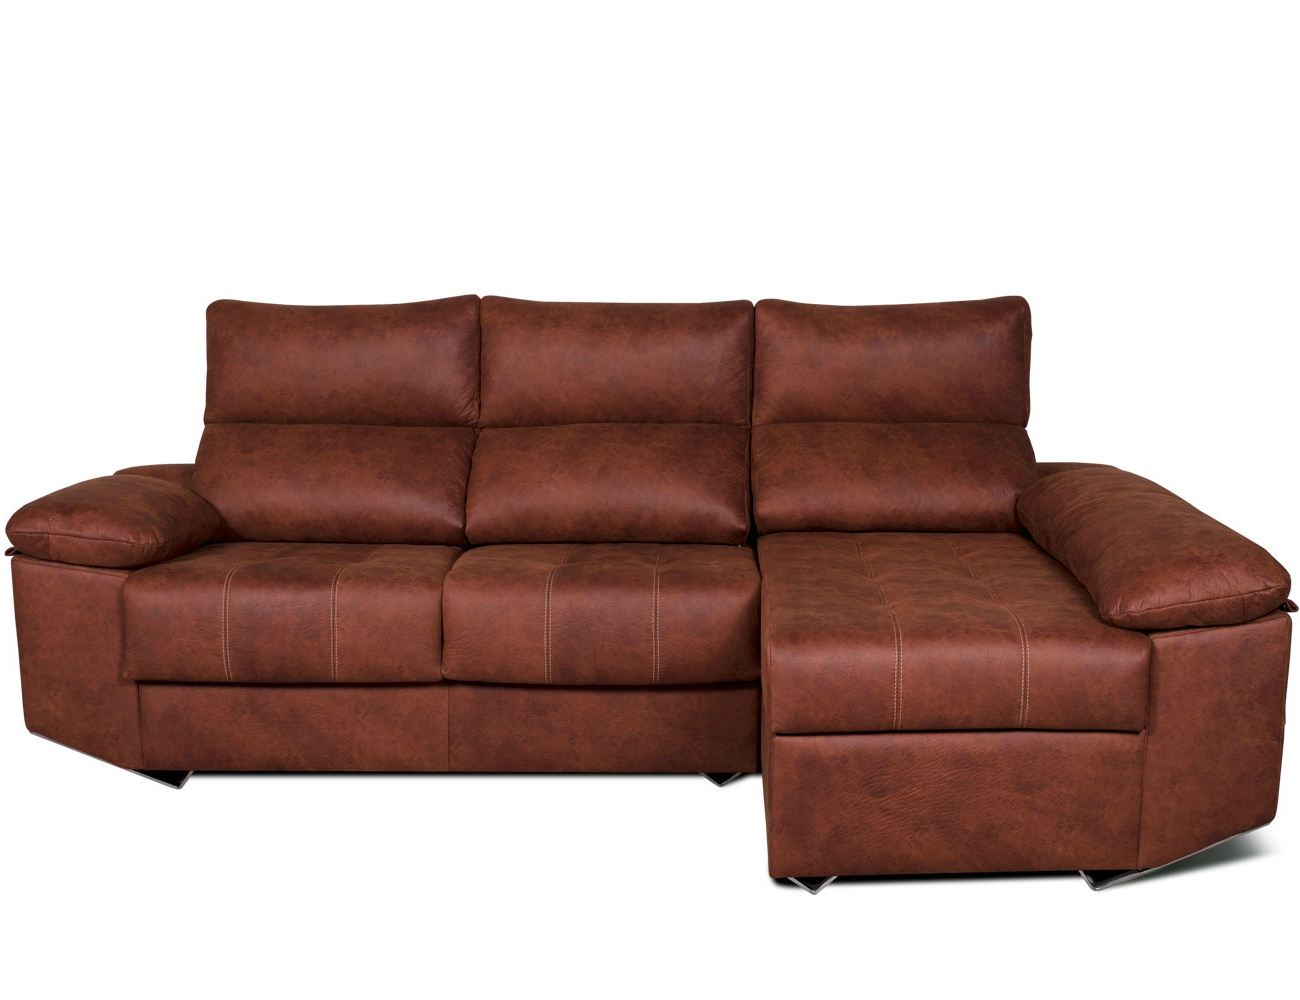 Sof chaiselongue de gama media alta con asientos - Sofas alta gama ...